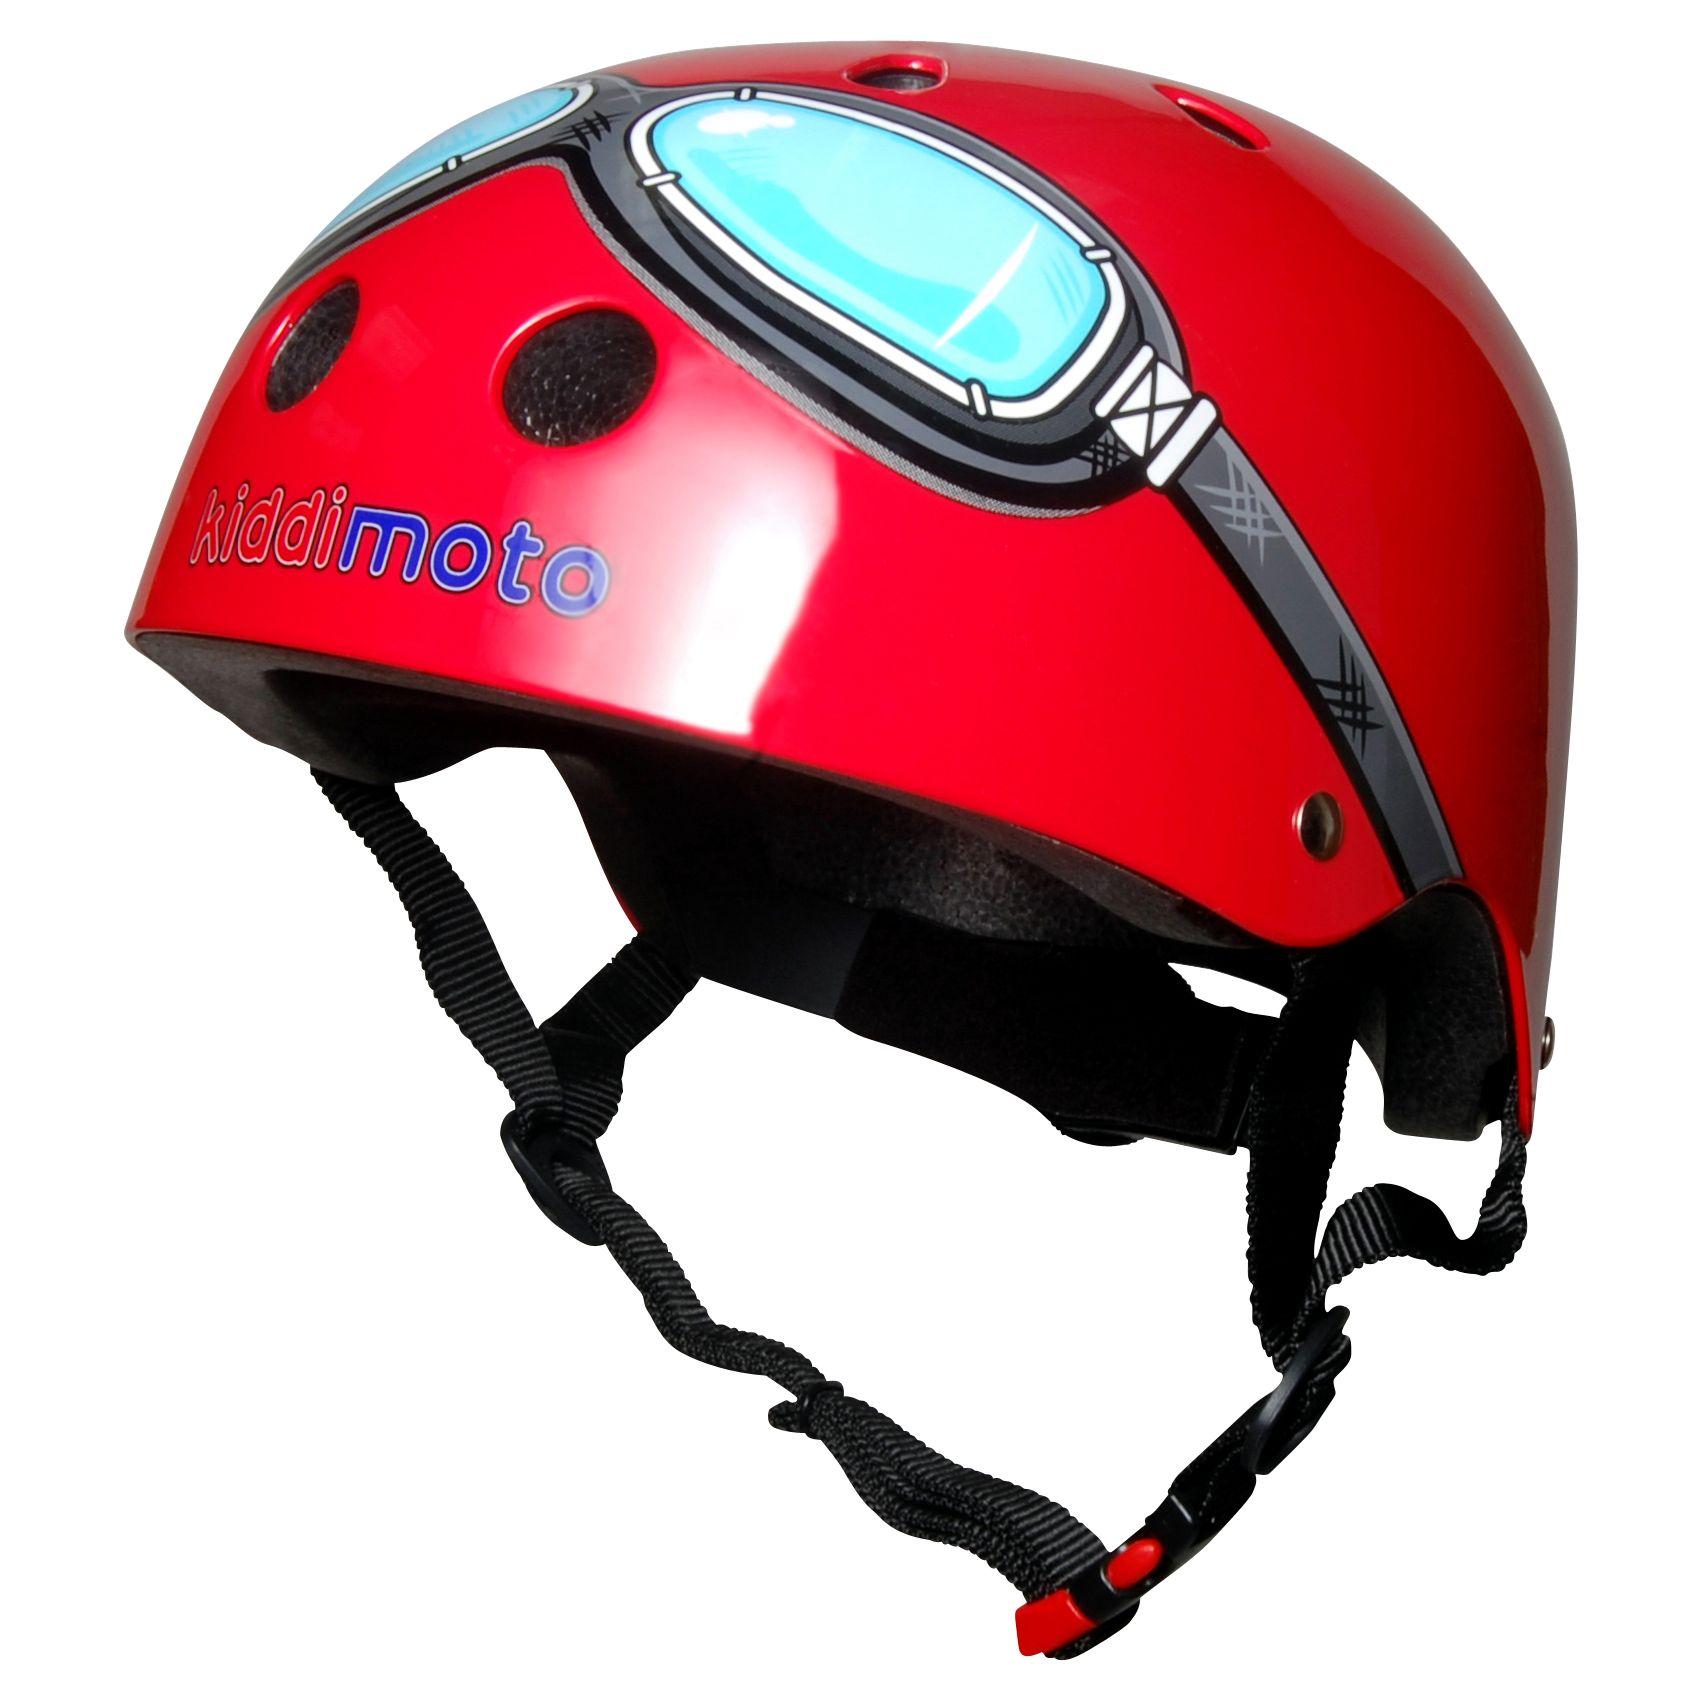 Kiddimoto Kiddimoto Red Goggles Helmet, Small